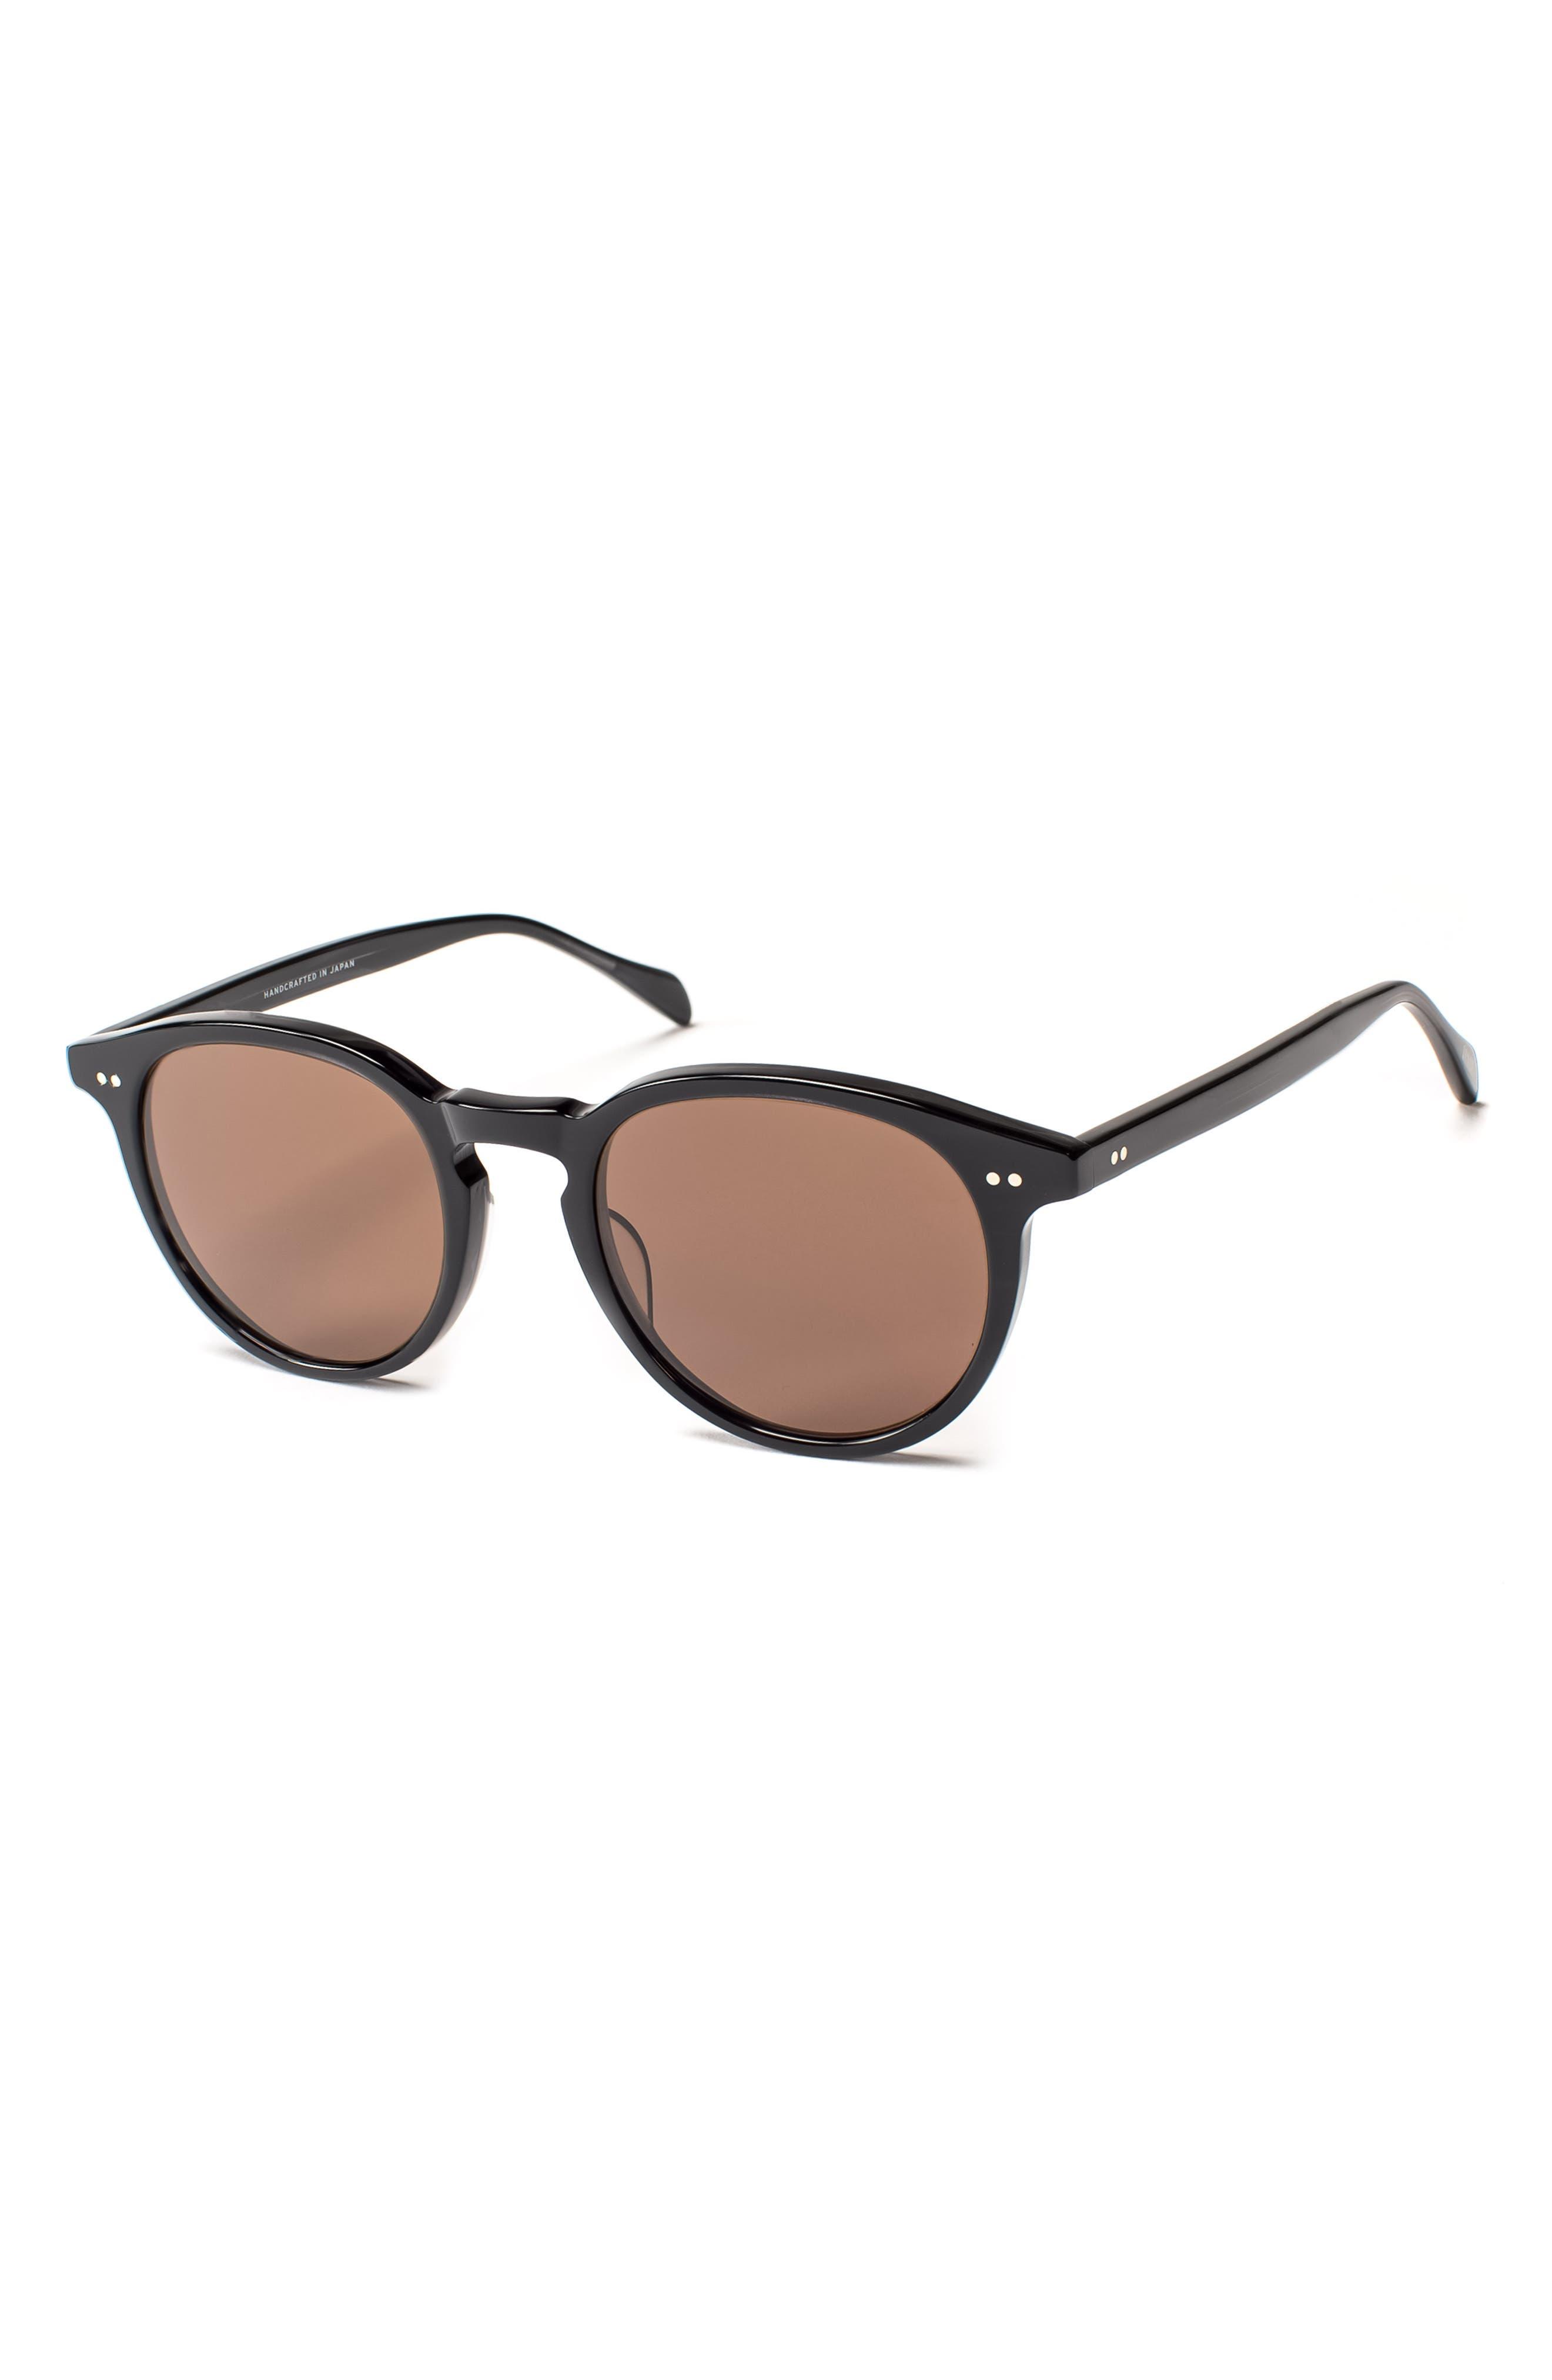 143f44b025 Salt. Buck 4m Polarized Sunglasses - Black Shadow